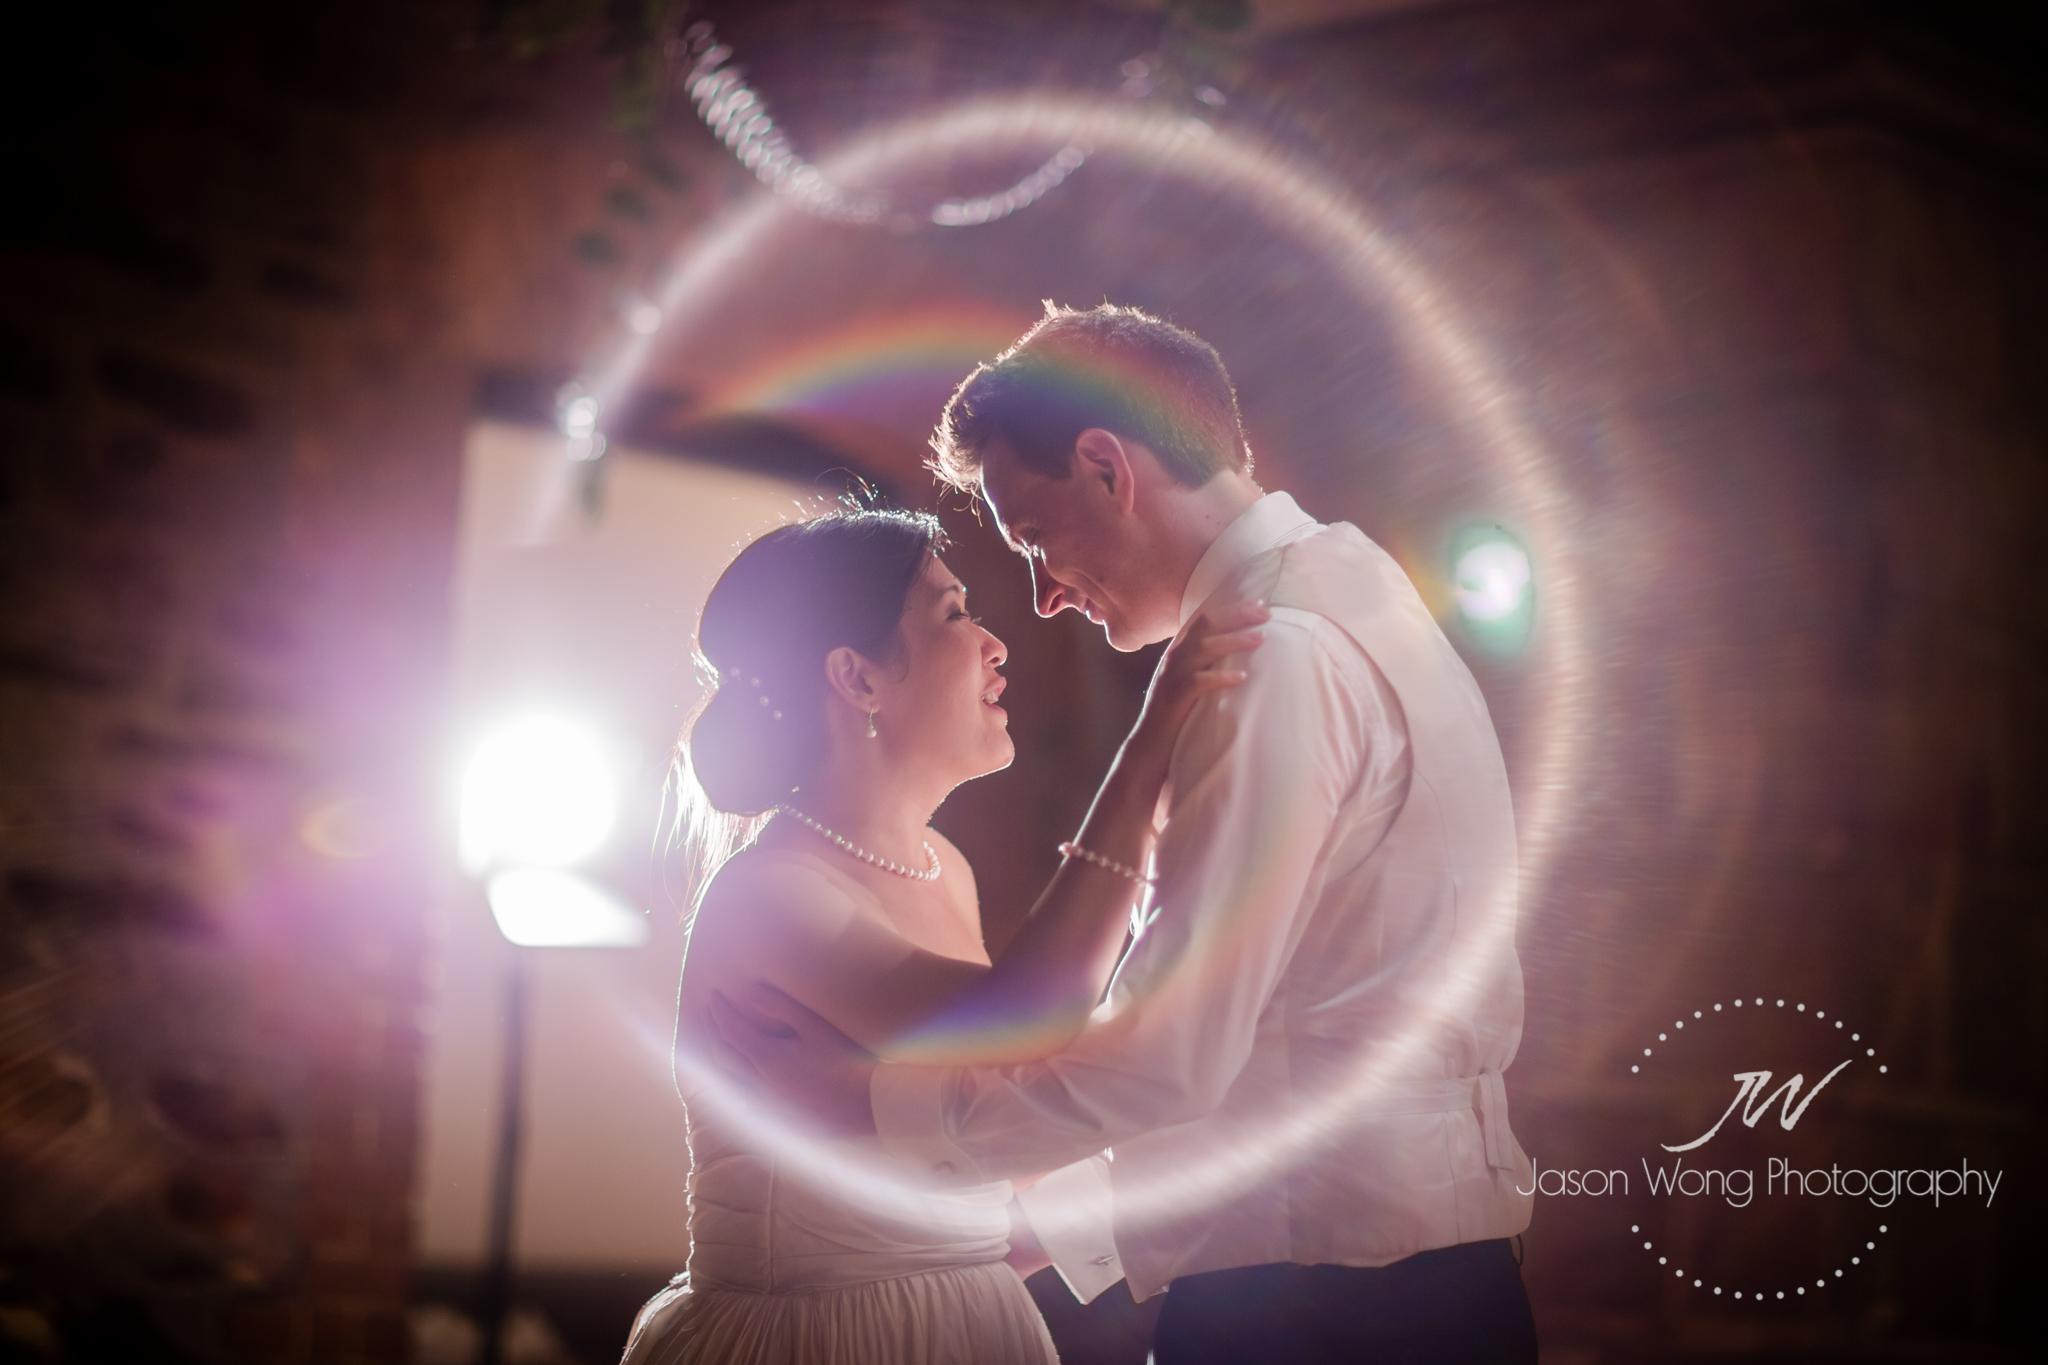 romantic-dance-with-halo-lighting.jpg